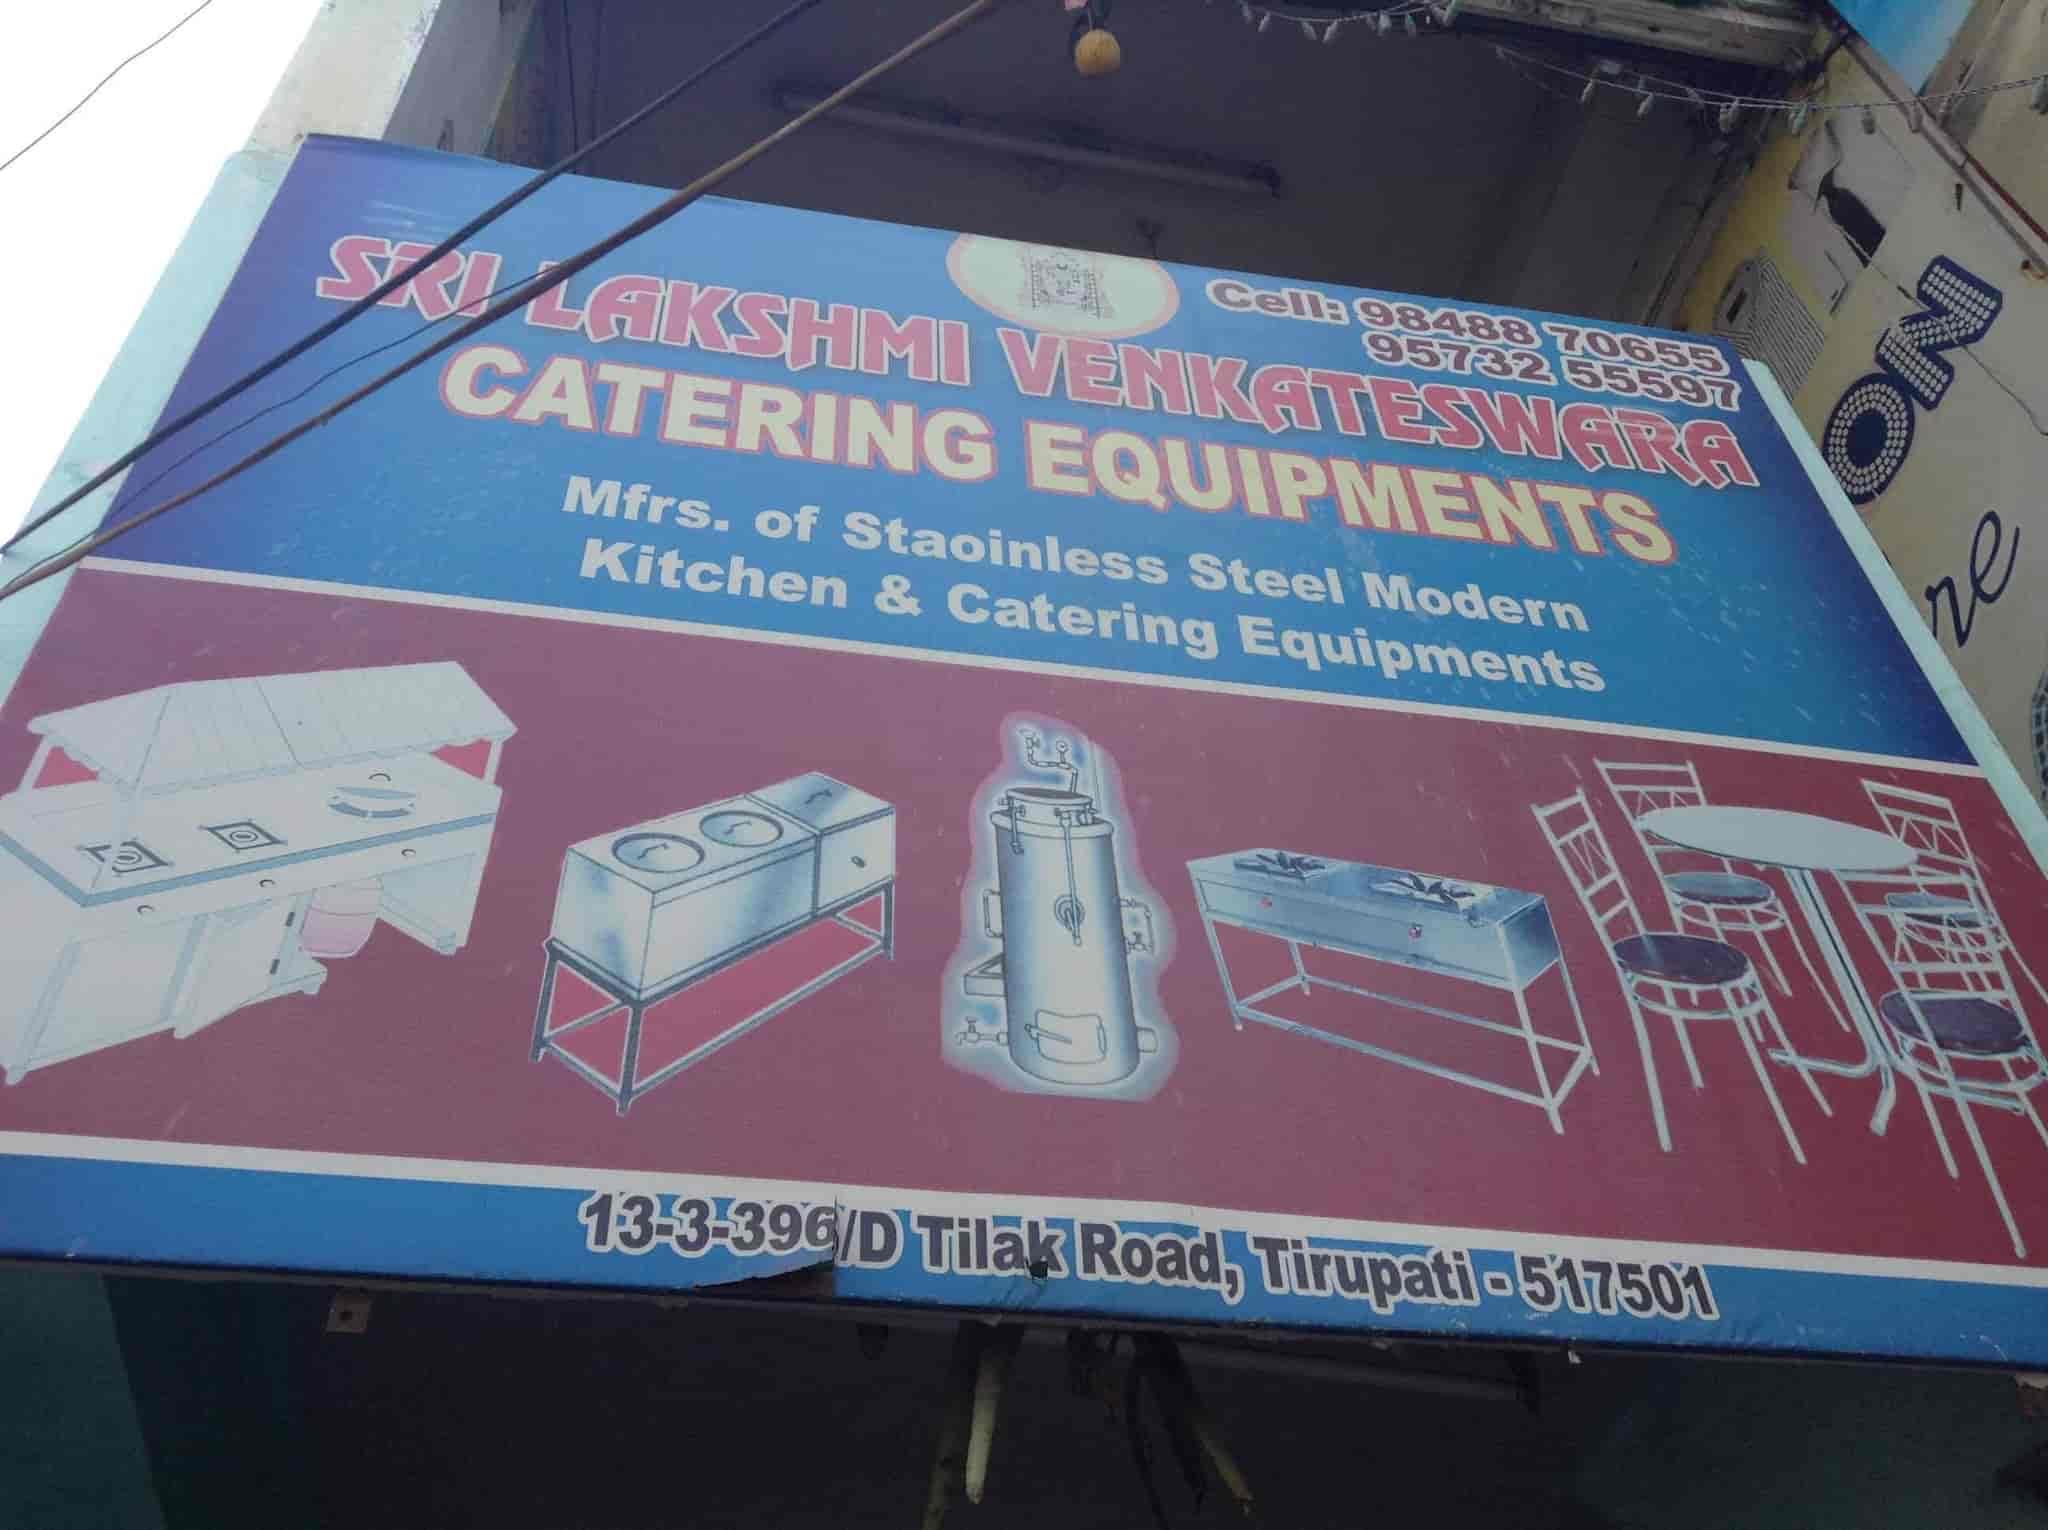 Sri Lakshmi Venkateswara Catering Equipment Photos, Tilak Road ...